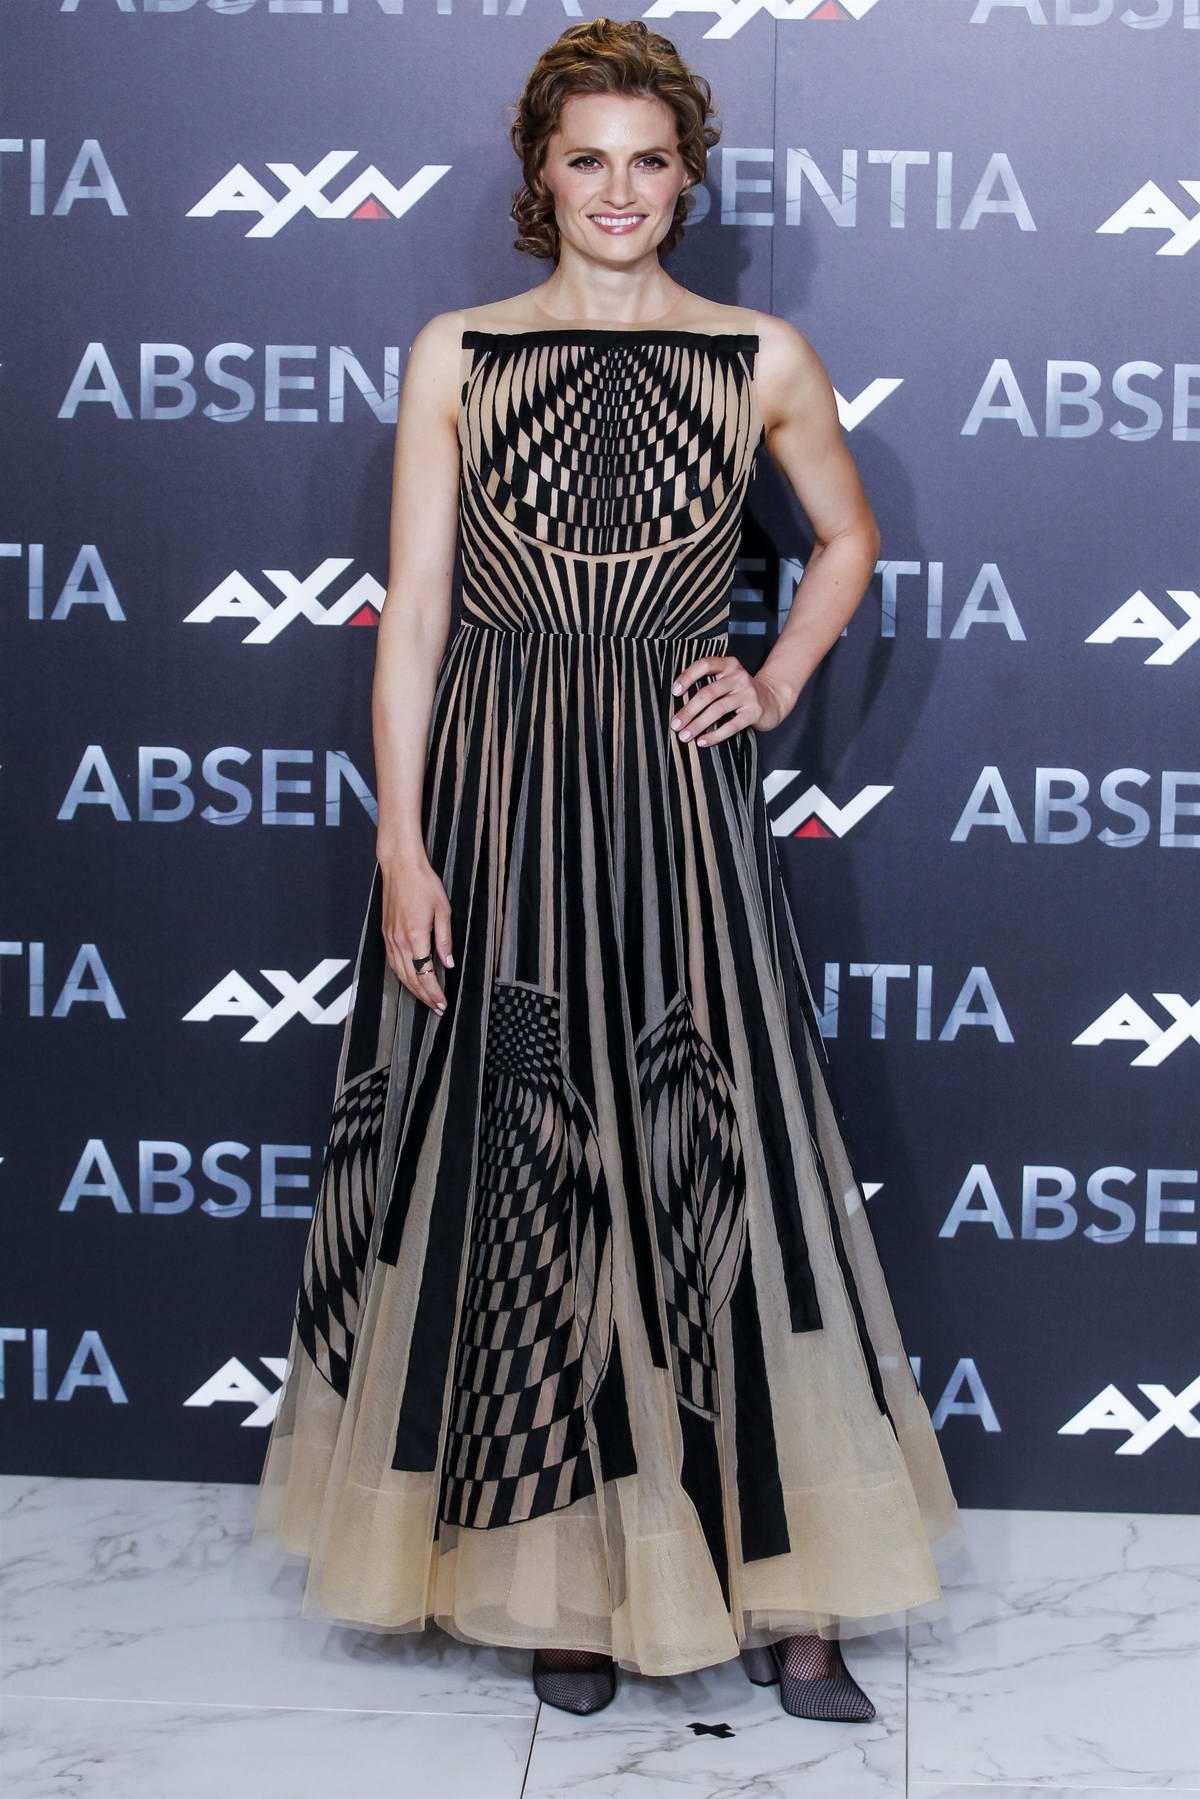 Stana Katic attends the presentation of Absentia season 2 at El Beatriz Auditorium in Madrid, Spain